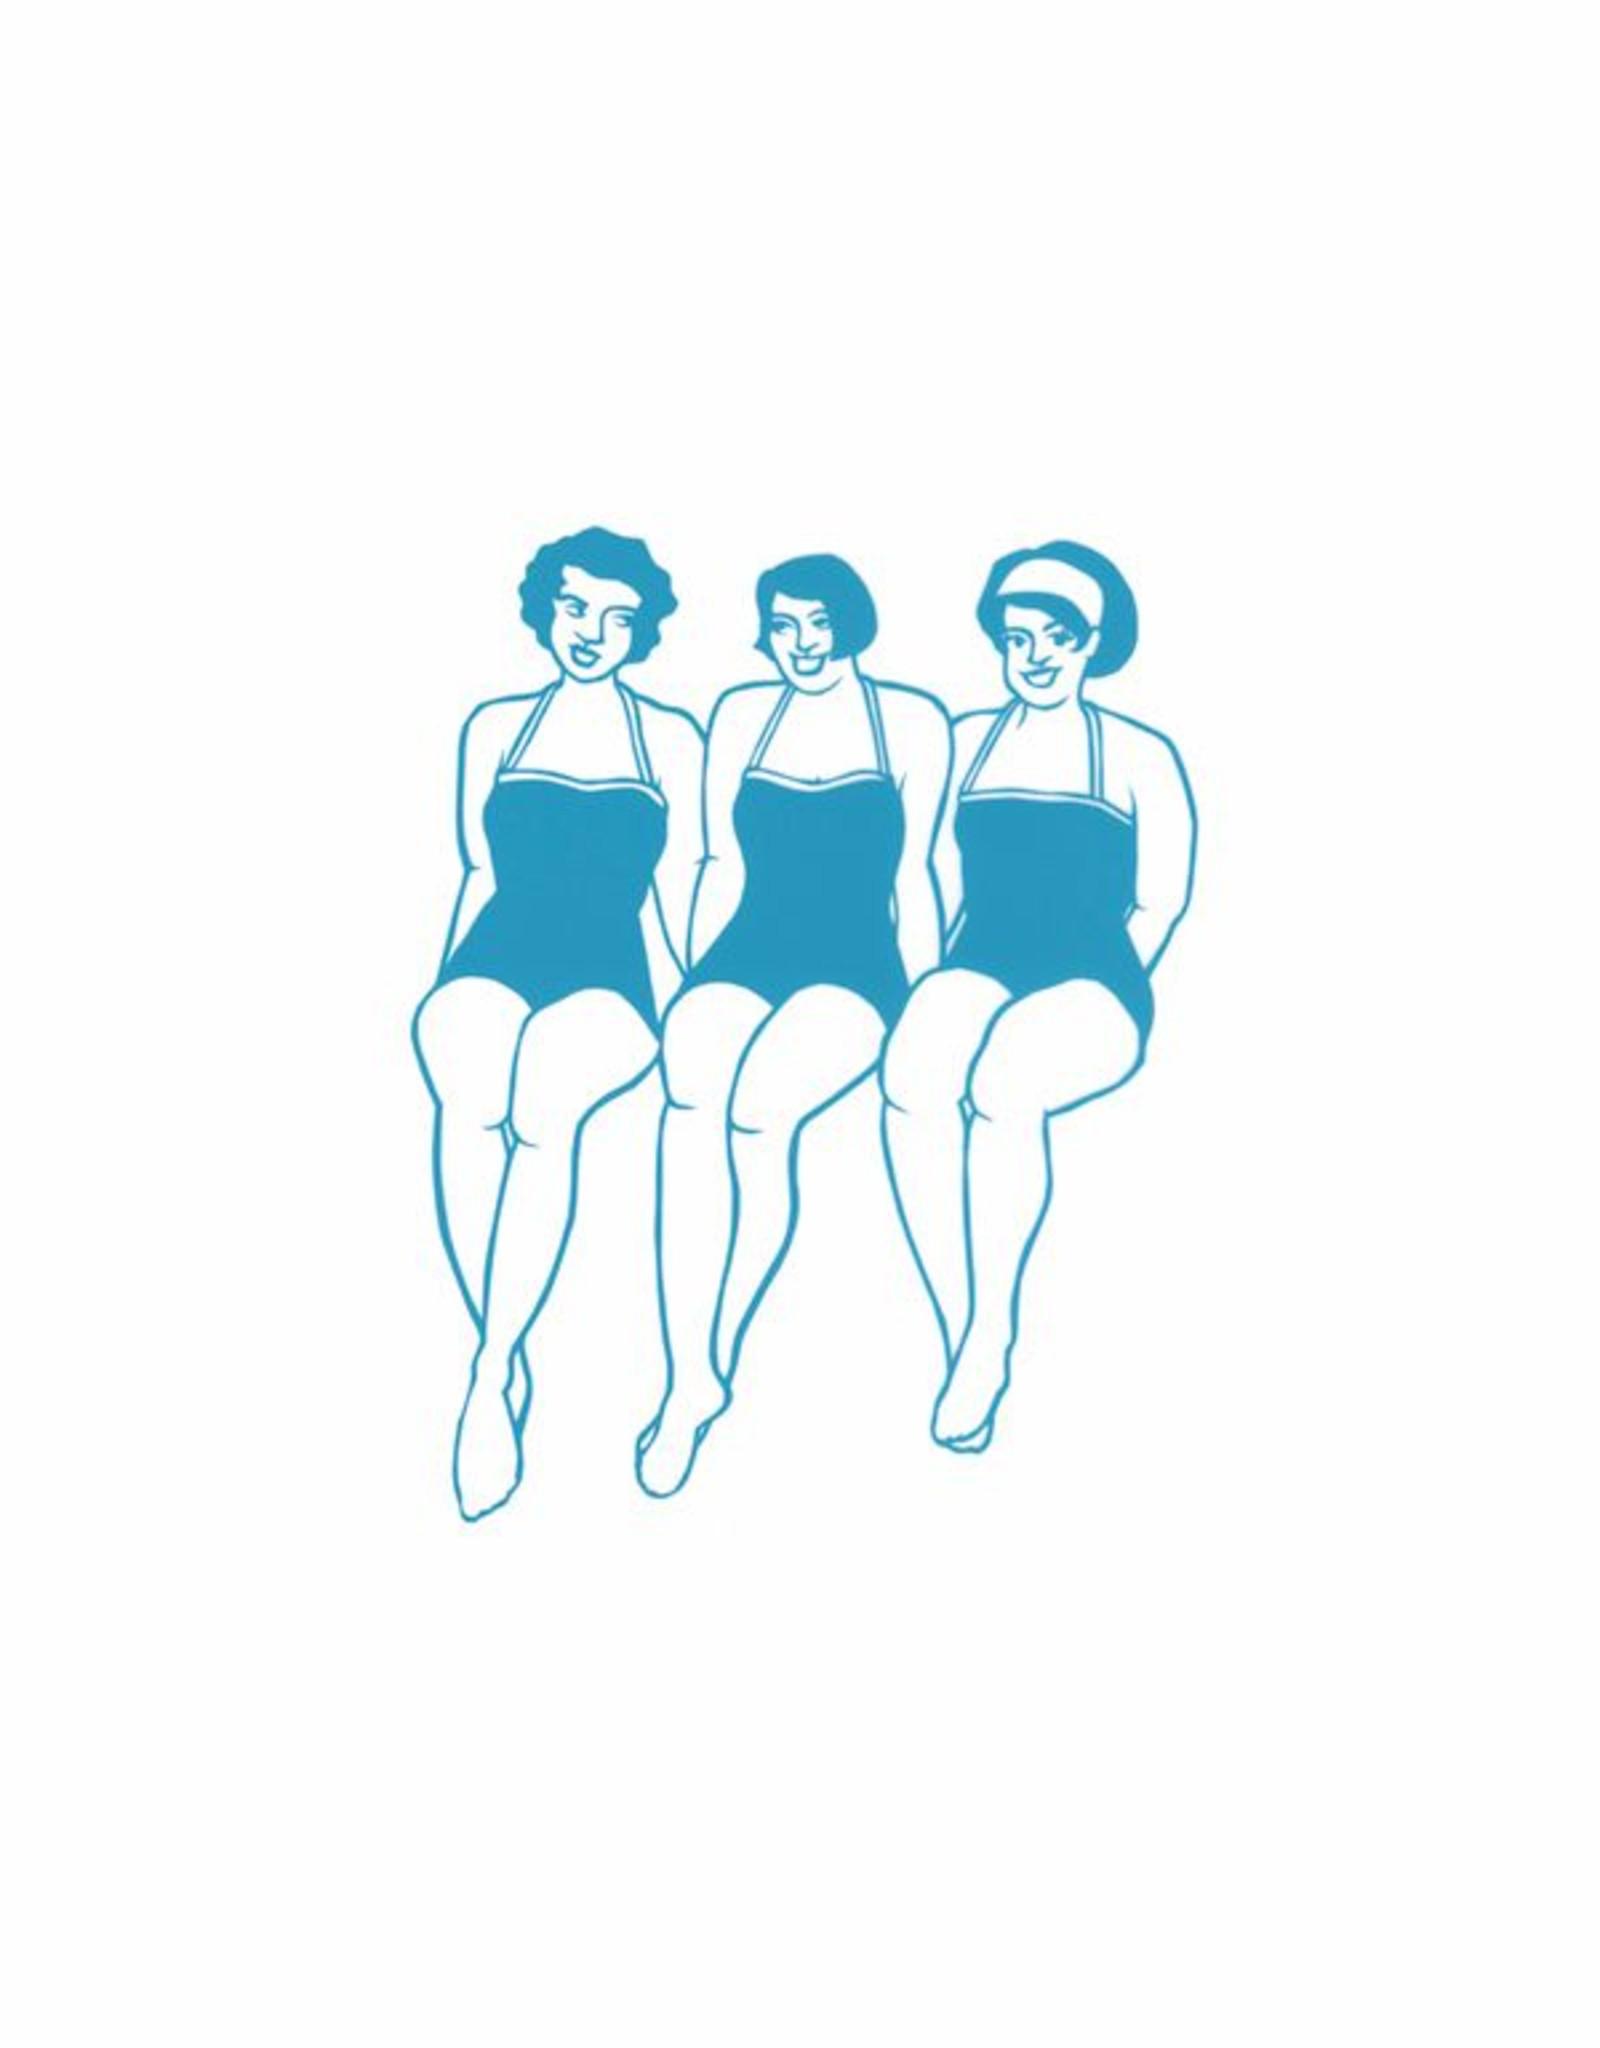 biebrich, tamara rae Team Lady… Splash (PaperCut folio)